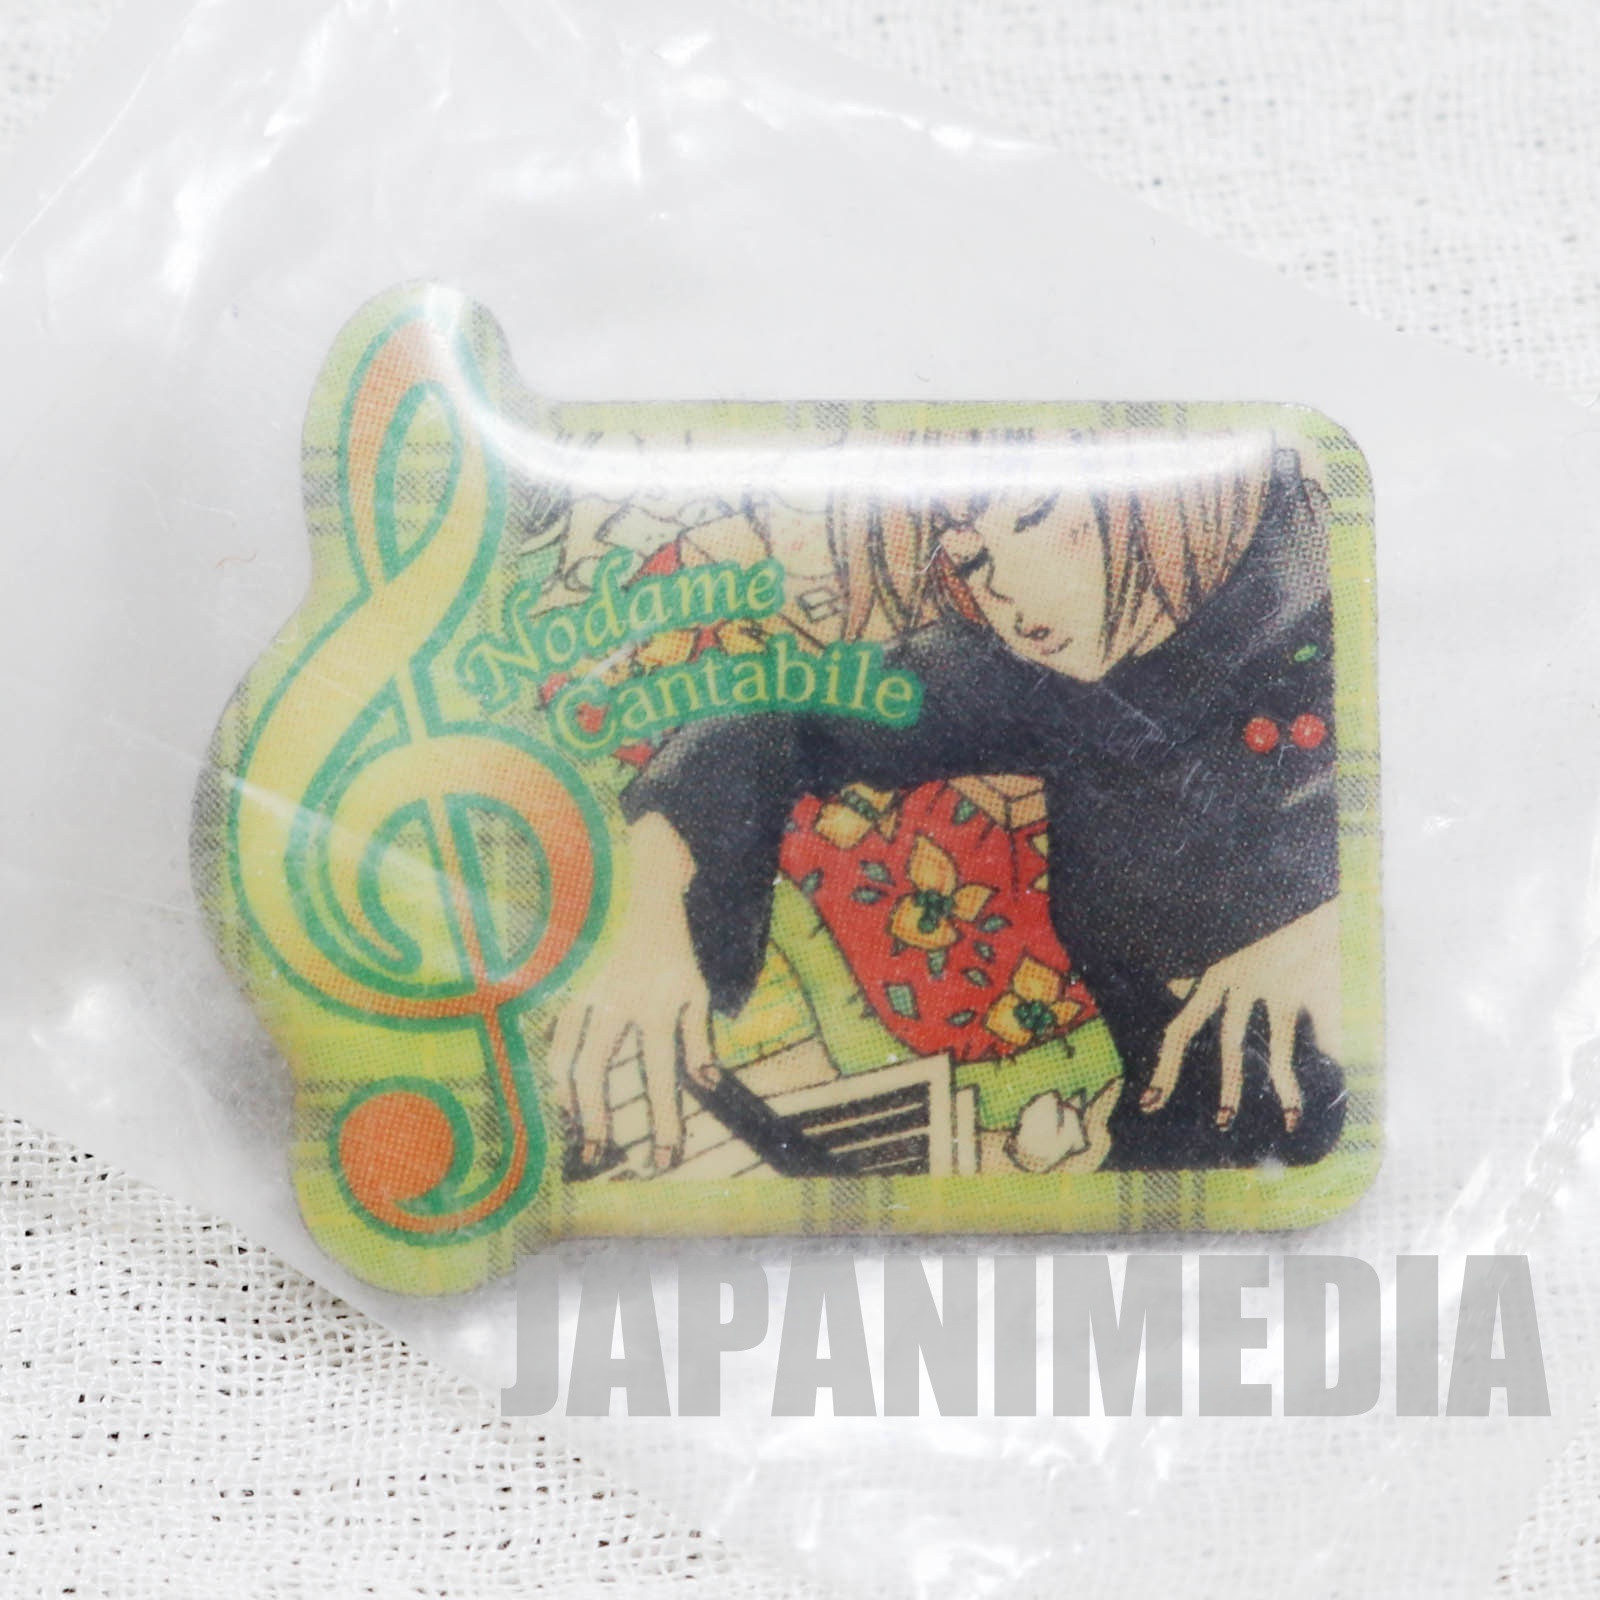 Nodame Cantabile Megumi Noda Gashapon Pins Collection JAPAN ANIME